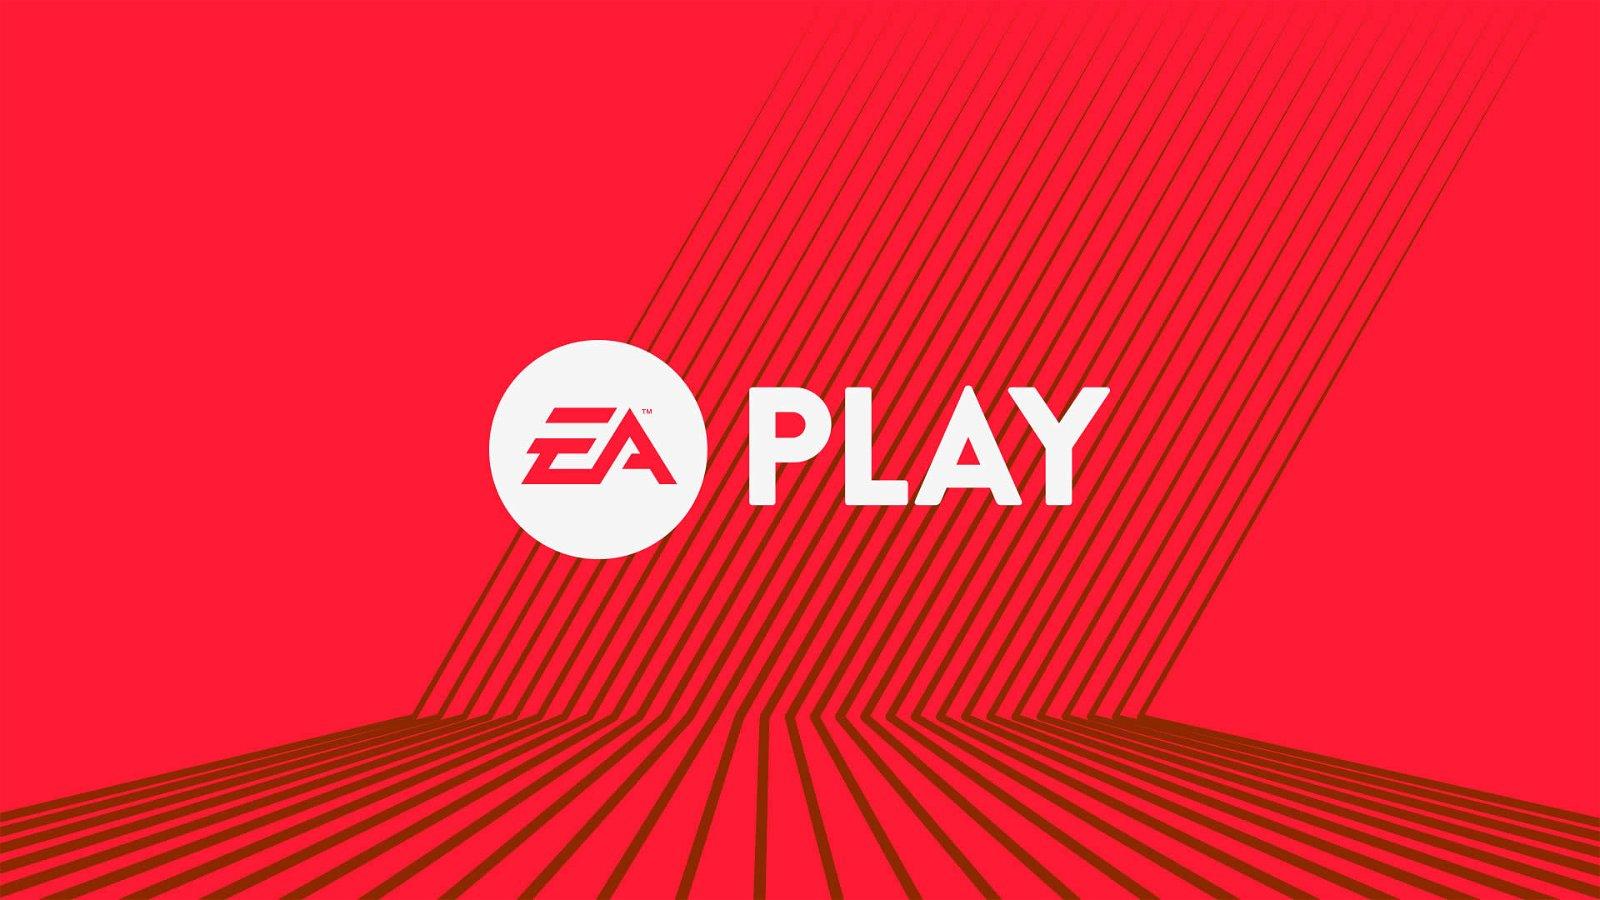 EA Play Unifies Origin Access and Access in Rebranding